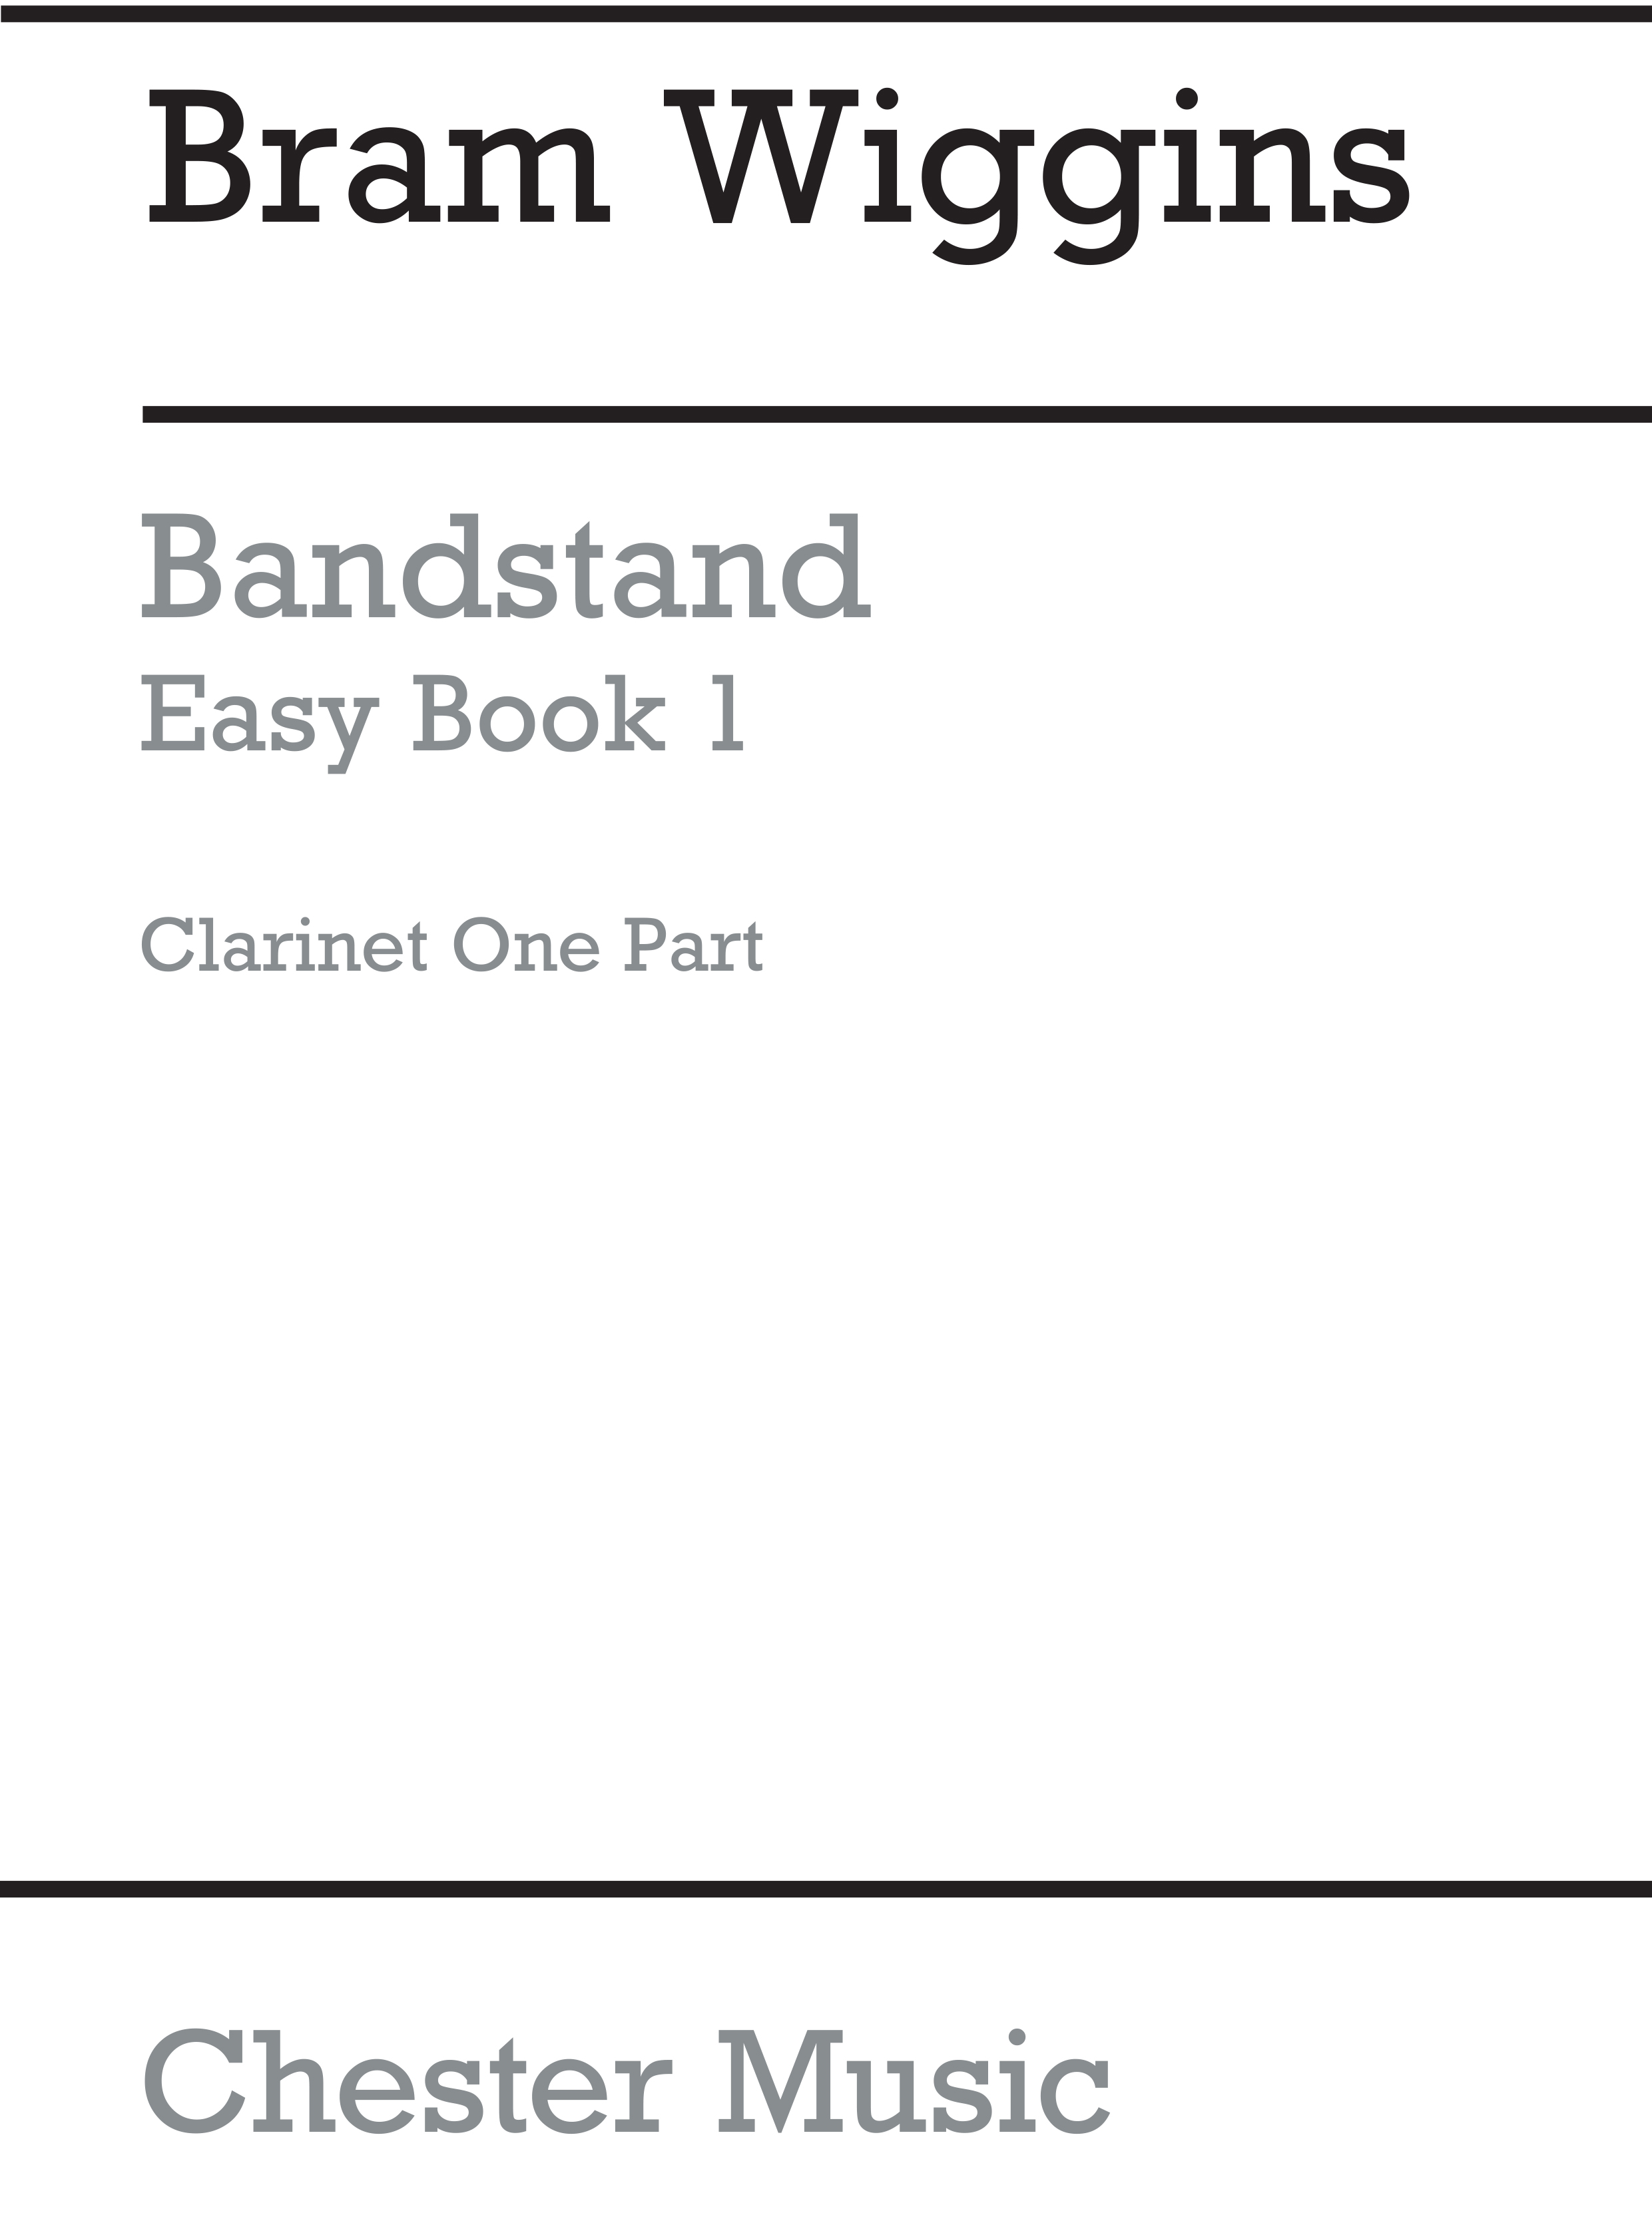 Bram Wiggins: Bandstand Easy Book 1 (Clarinet 1): Concert Band: Part